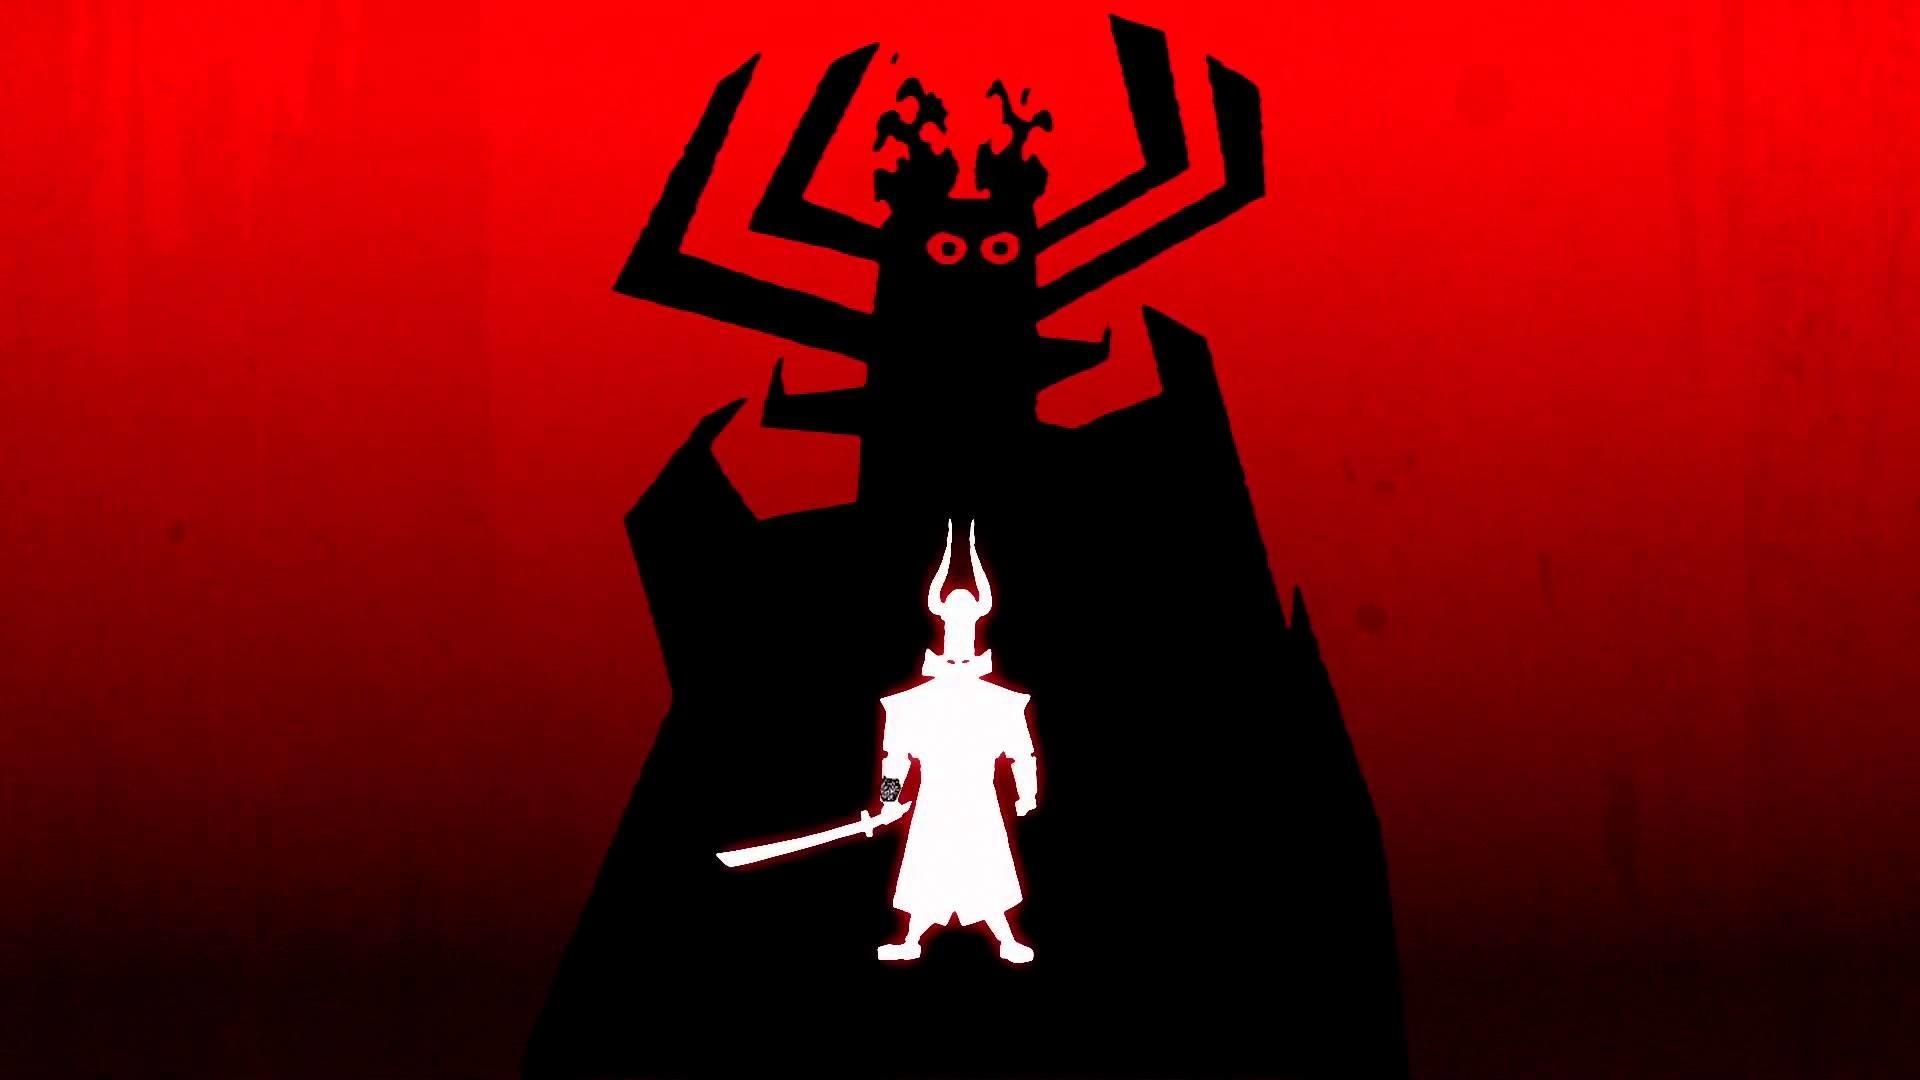 Res: 1920x1080, Cartoon Wallpapers. Download the following Samurai Jack ...